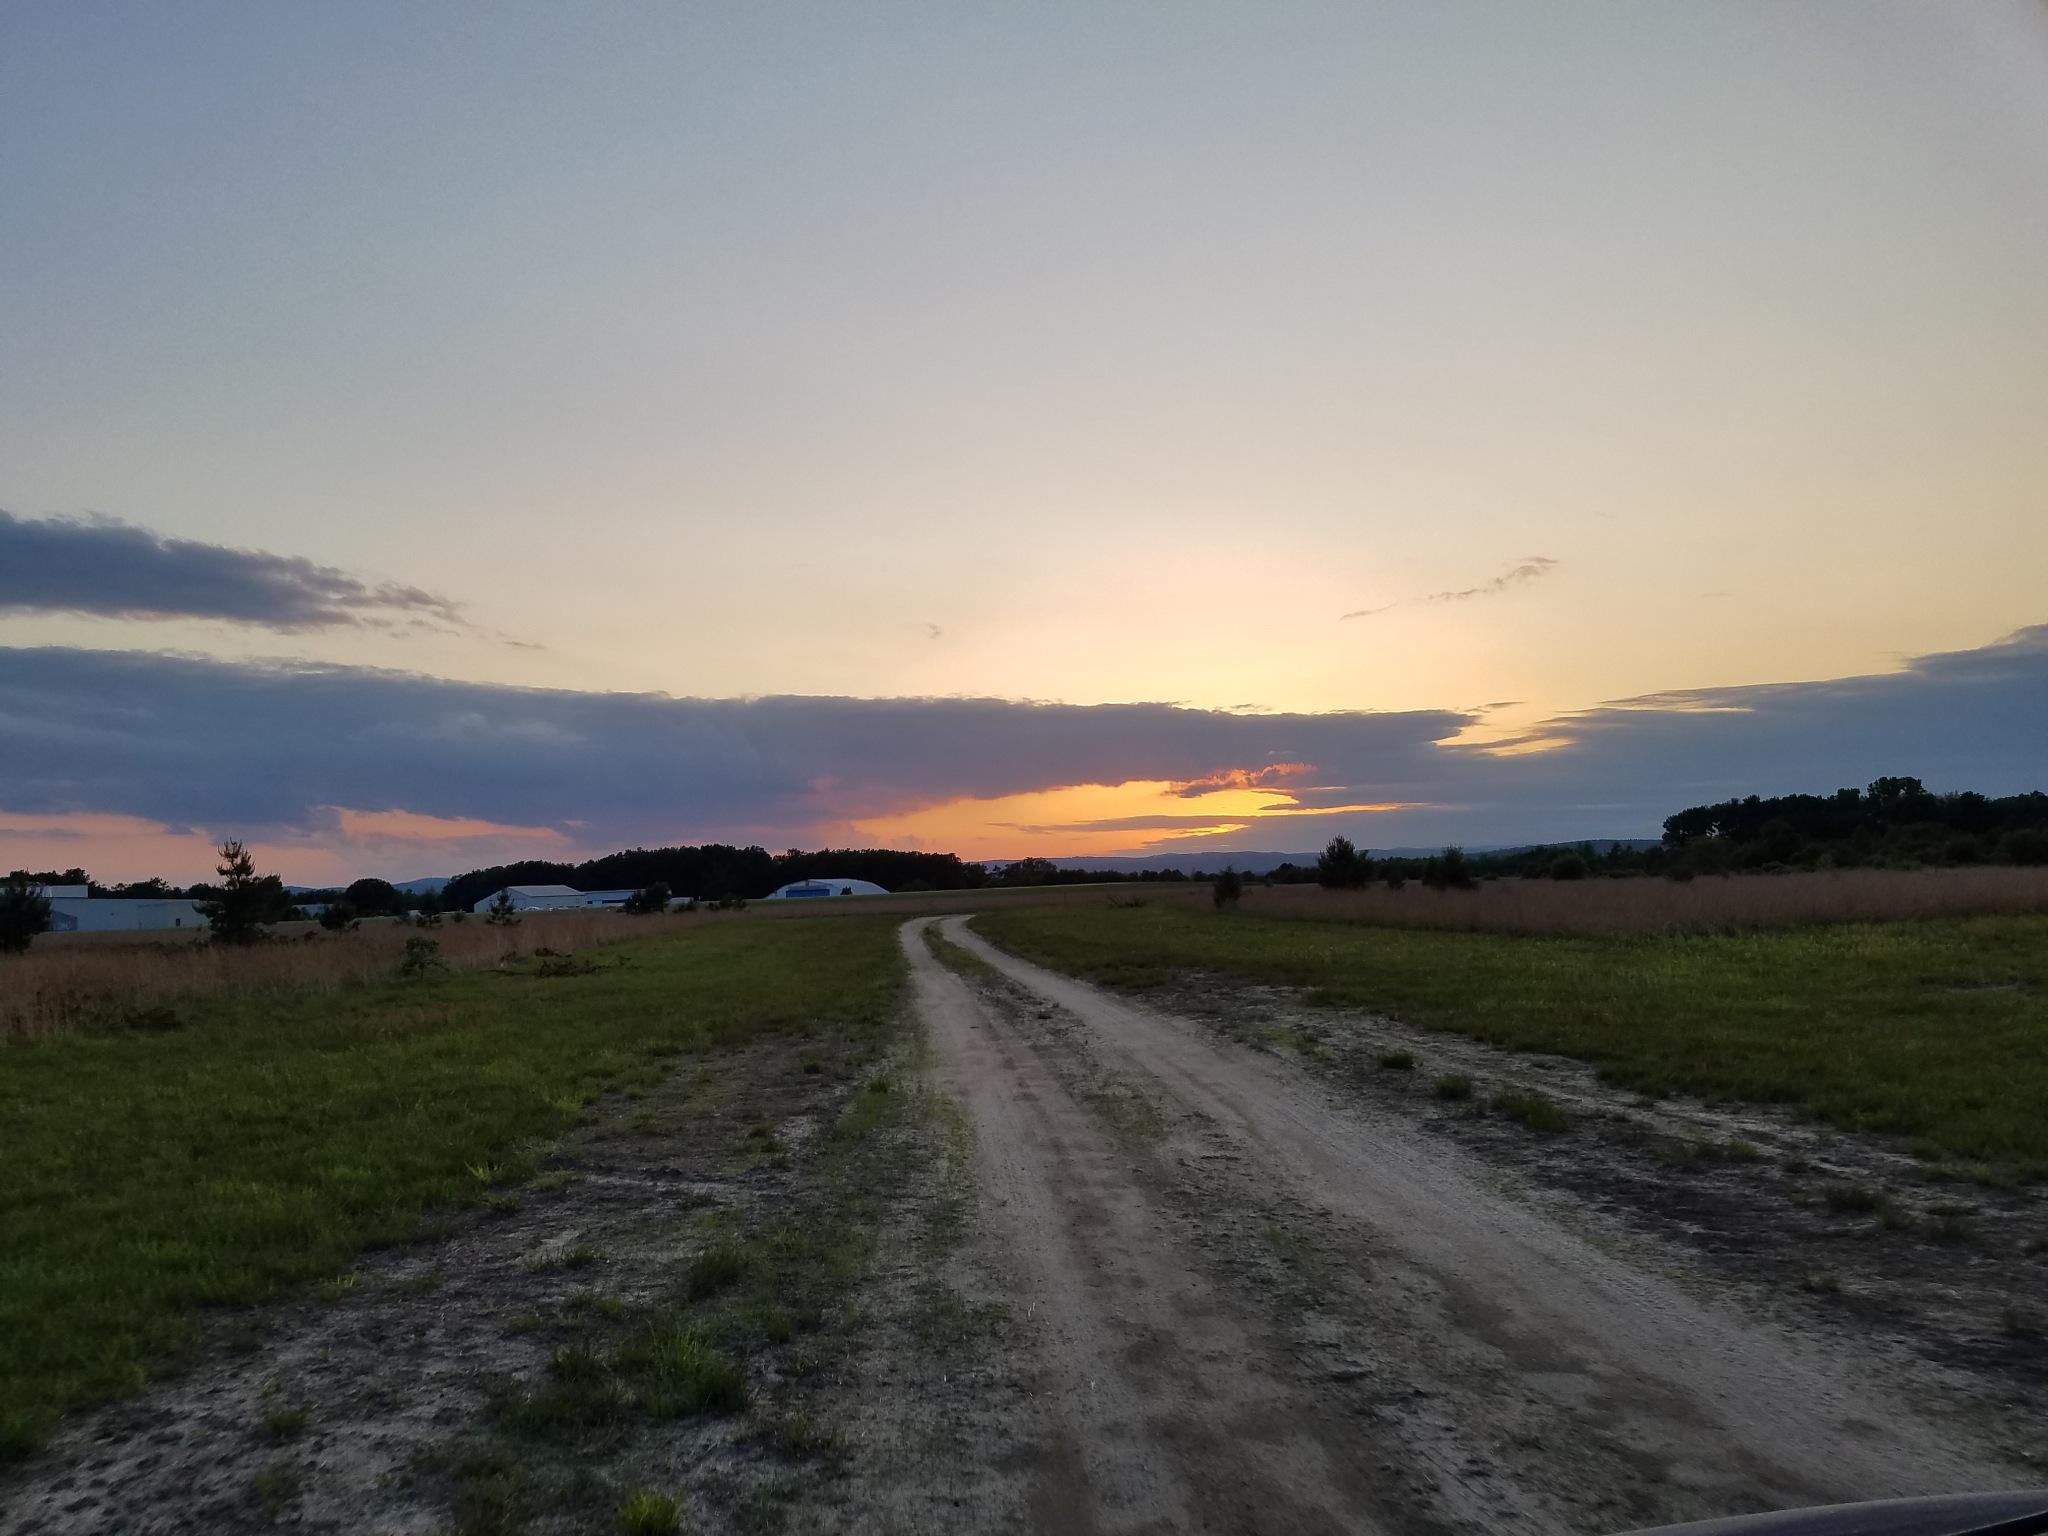 lonely road at dusk by David Korpiewski